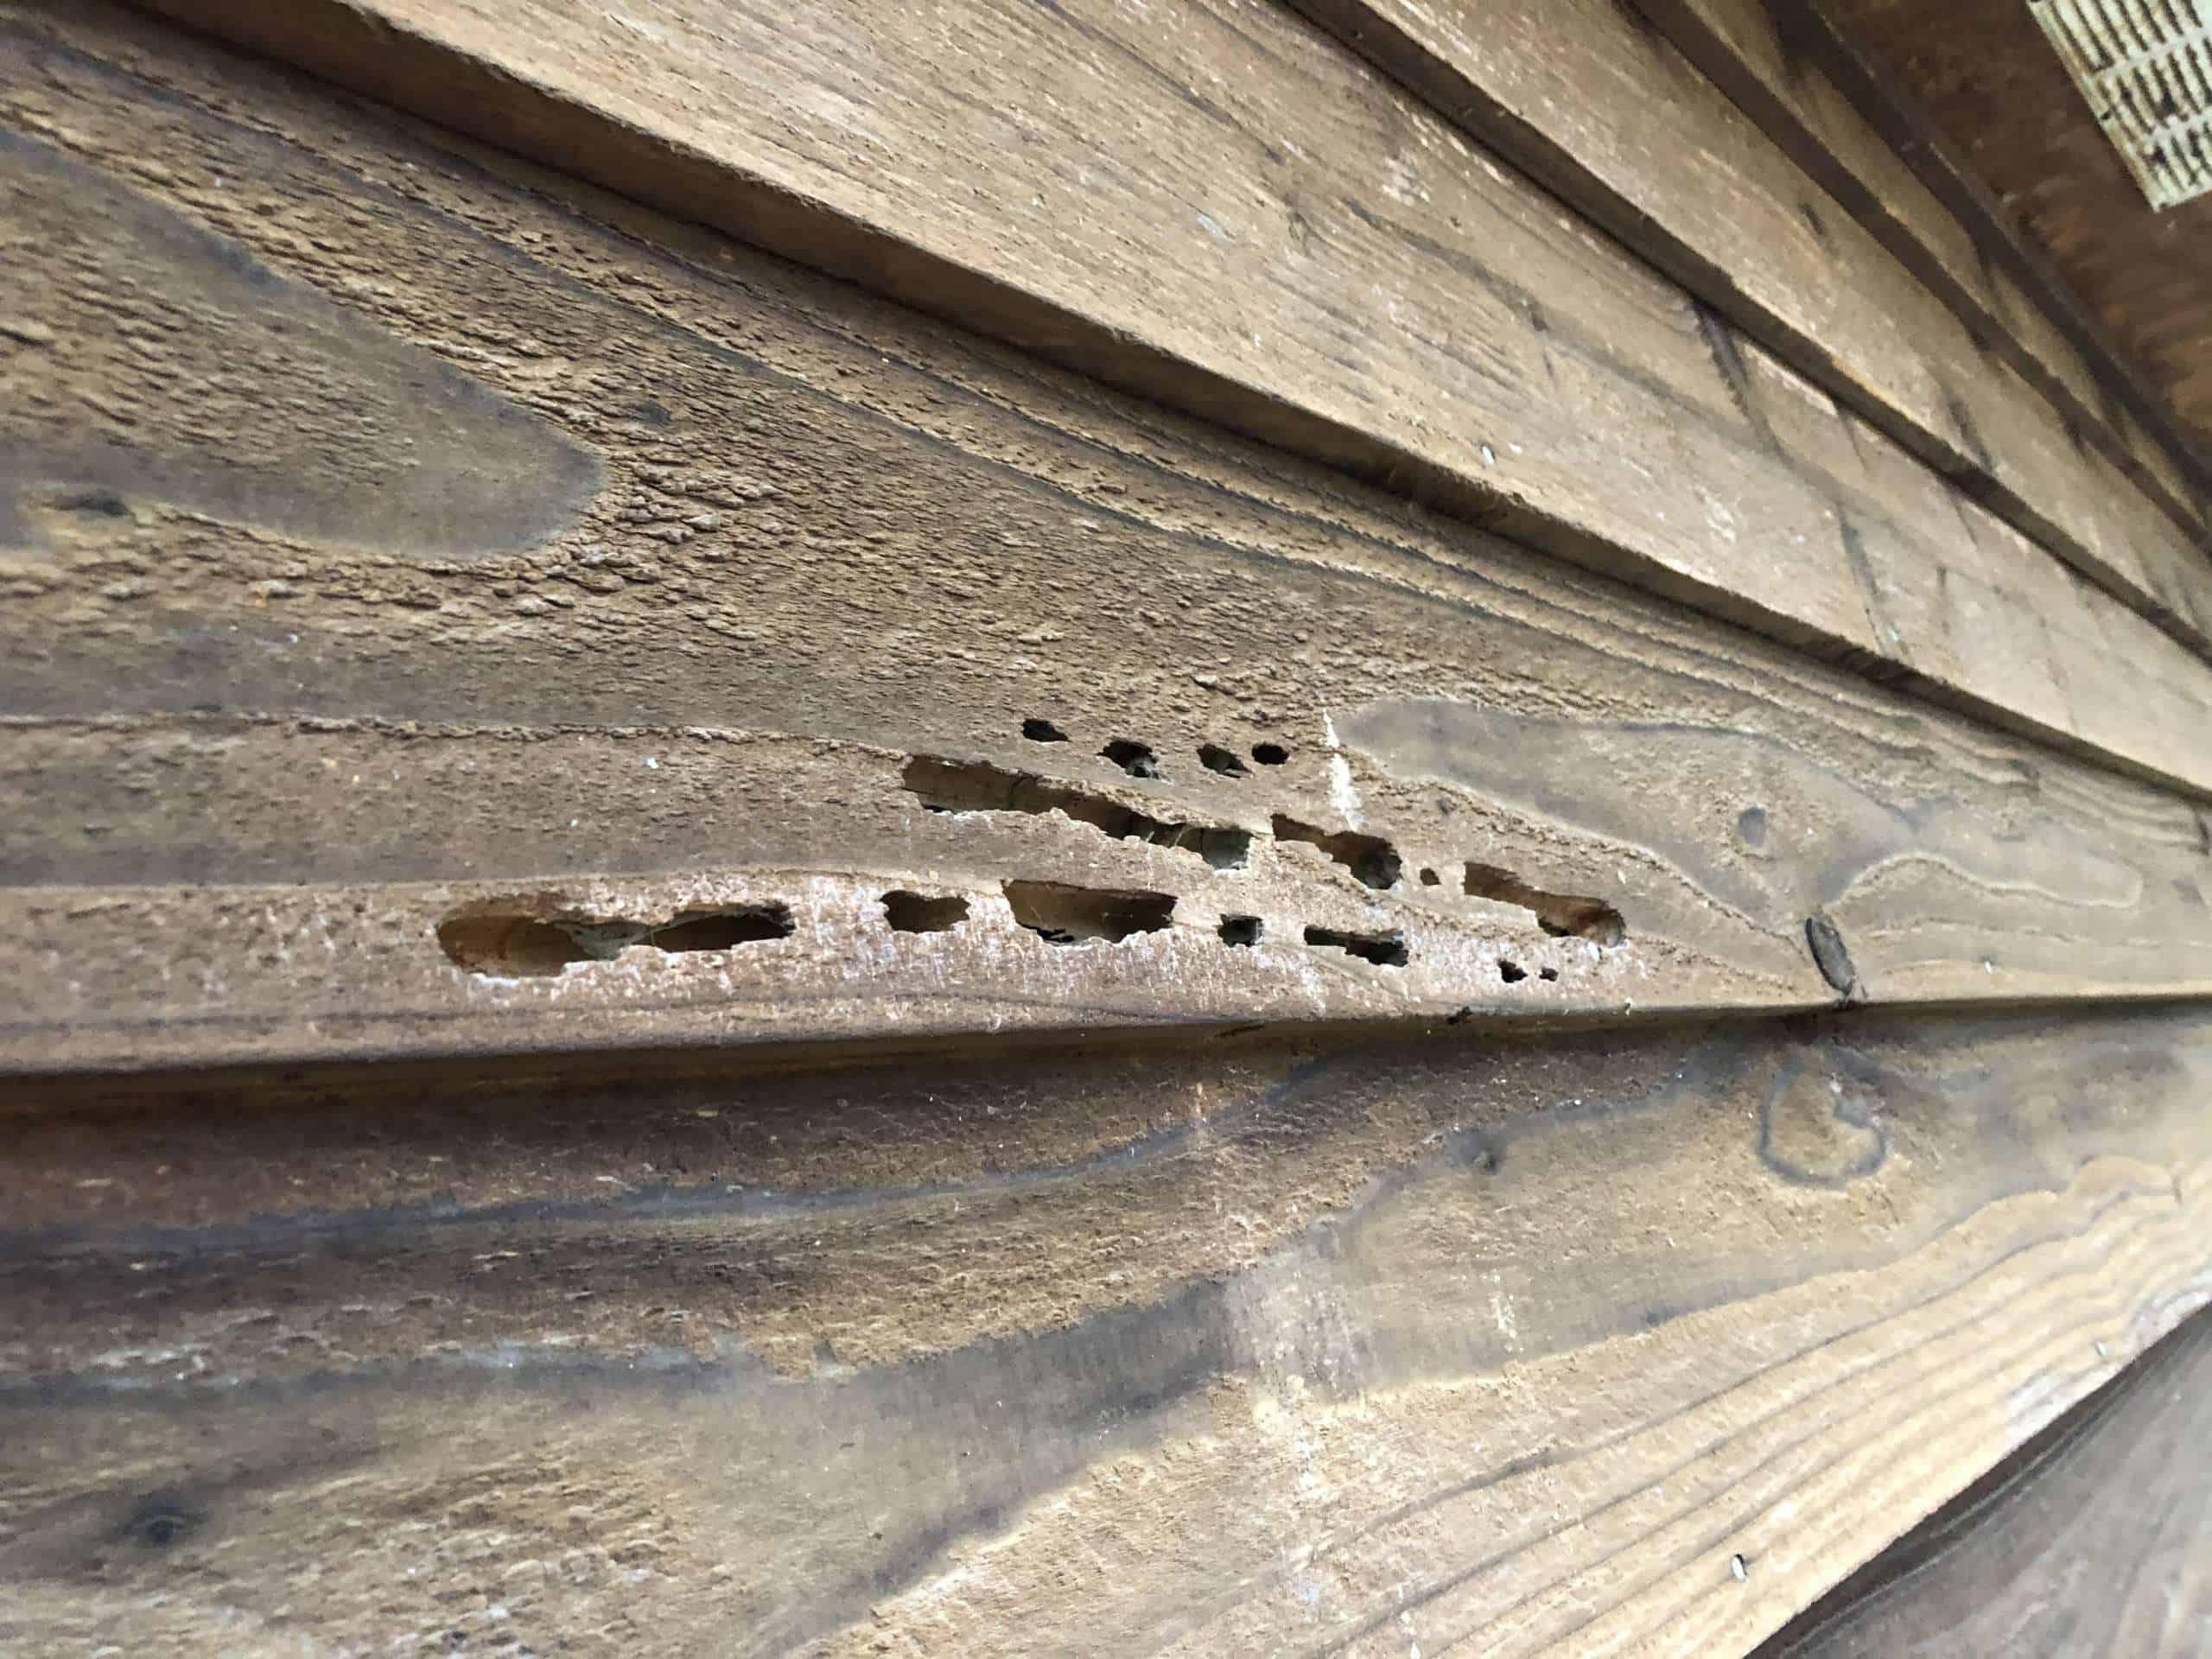 Siding with Termite Damage